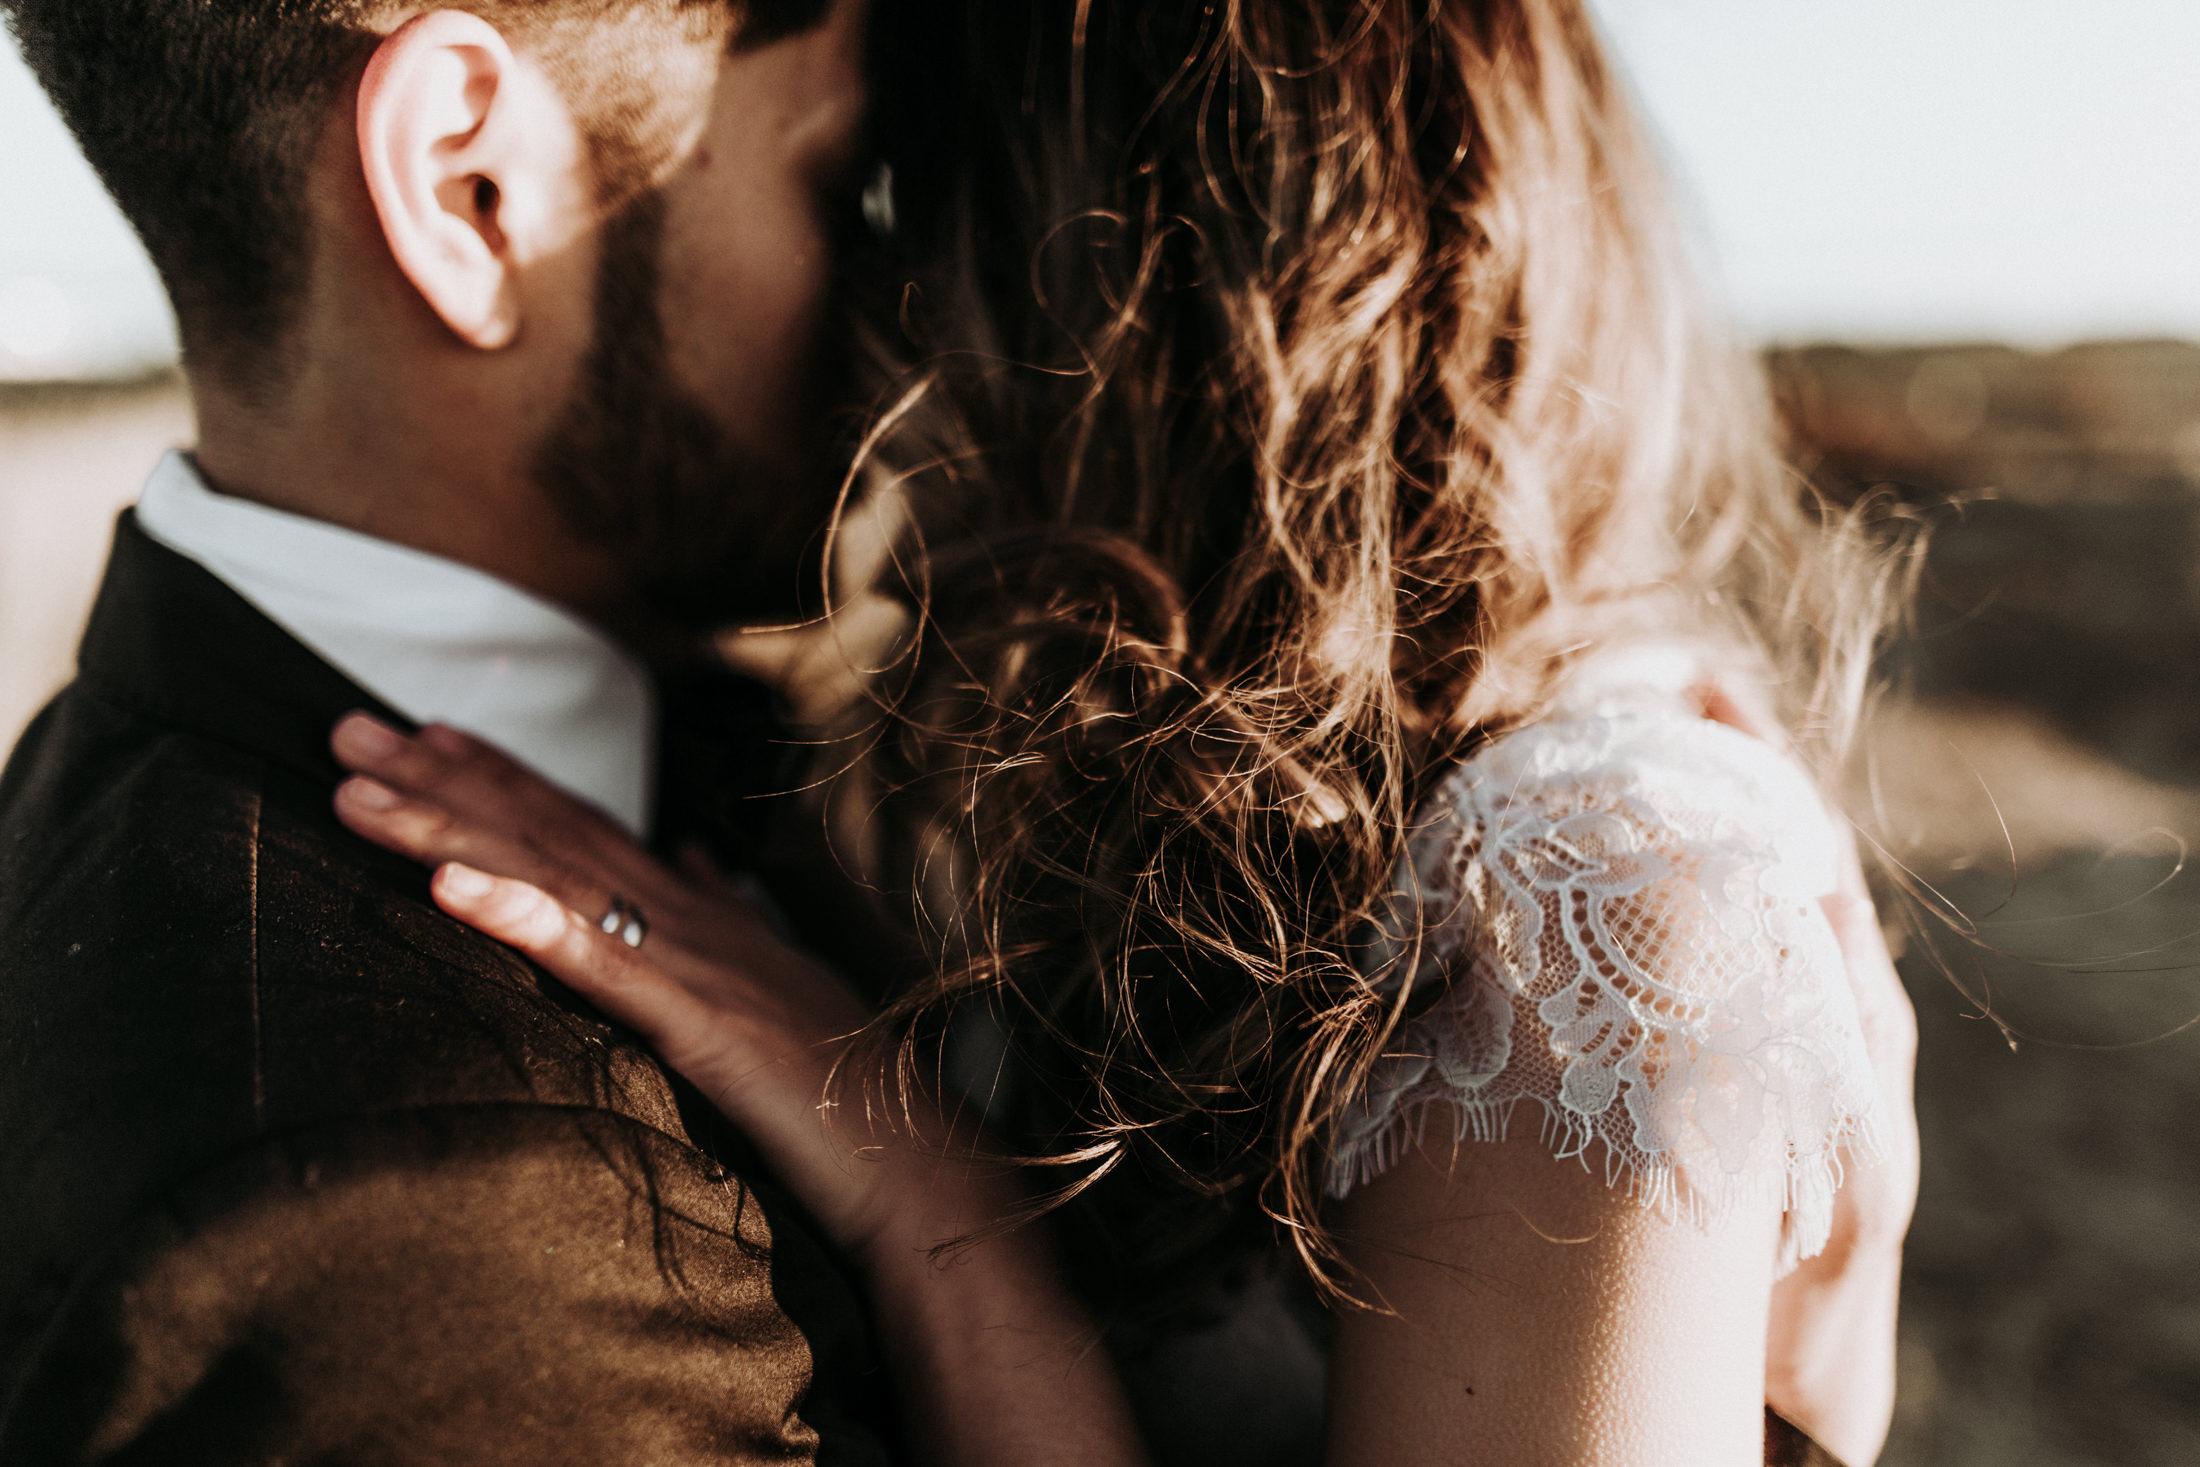 Wedding_Photographer_Mallorca_Daniela-Marquardt_Photography_CanaryIslands_Lanzarote_Iceland_Tuskany_Santorini_Portugal_Schweiz_Austria_Bayern_Elopement_Hochzeitsfotograf_Norddeichich_47